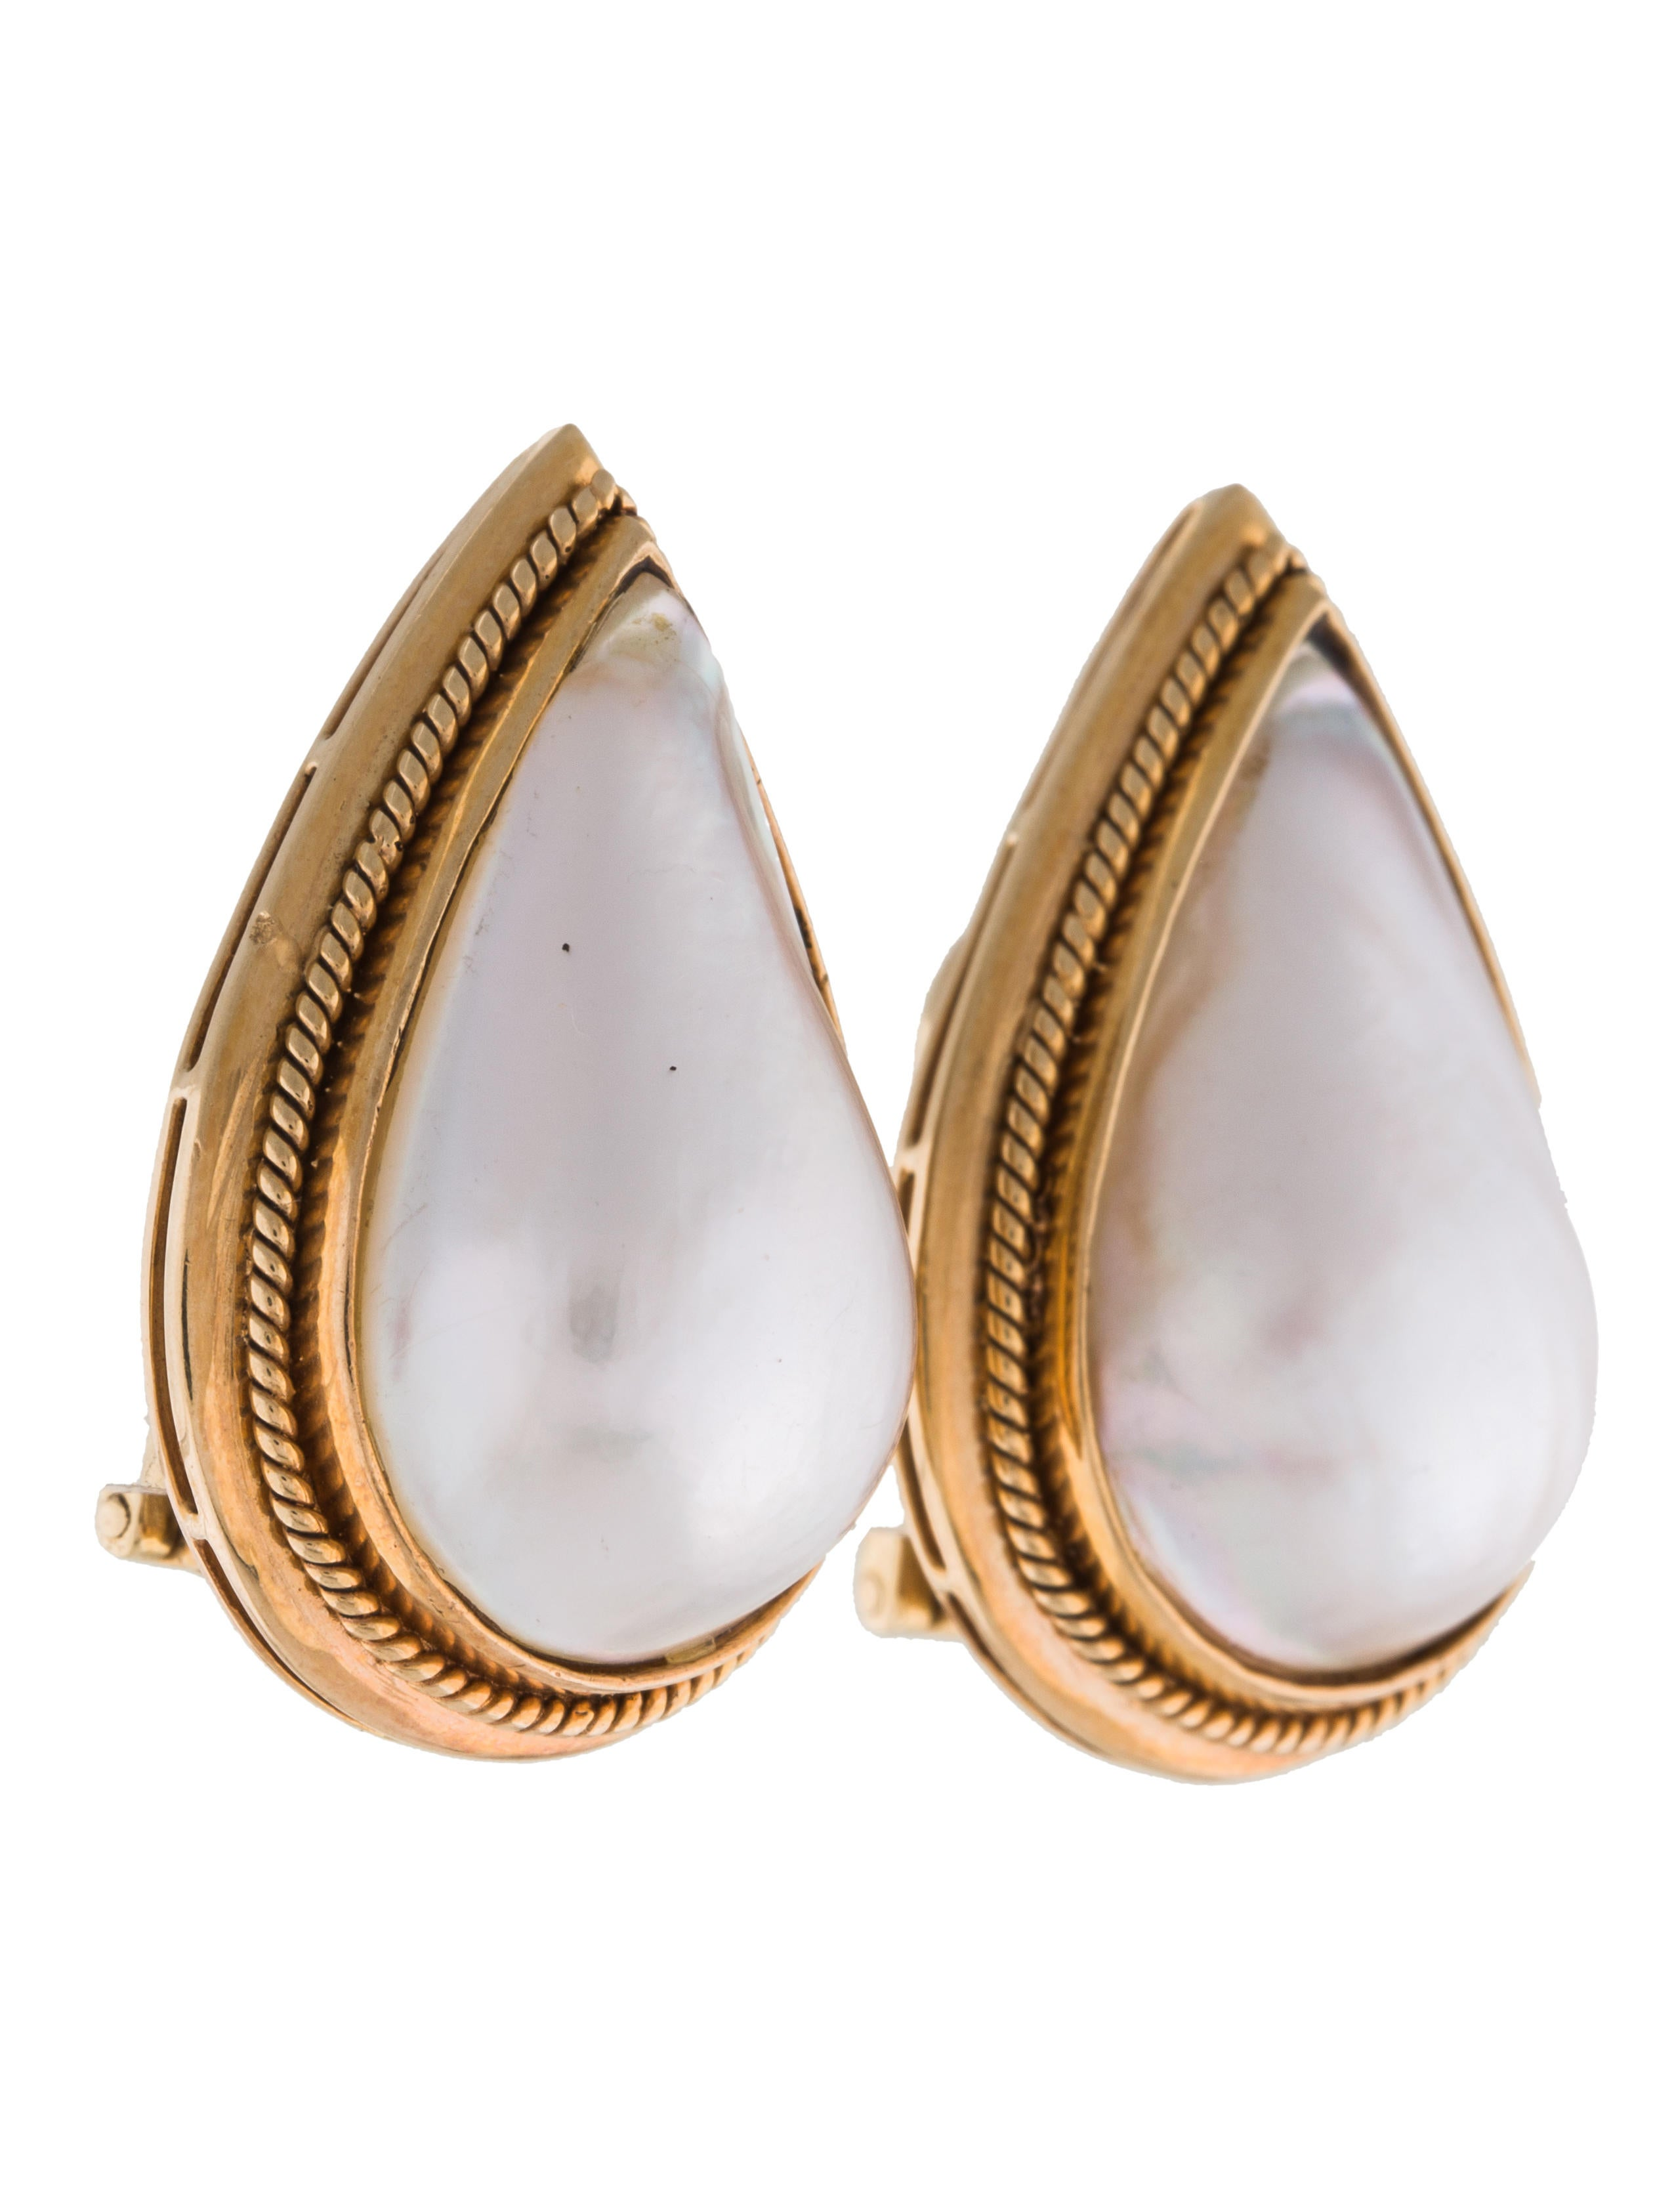 18k mab pearl teardrop clip on earrings earrings. Black Bedroom Furniture Sets. Home Design Ideas